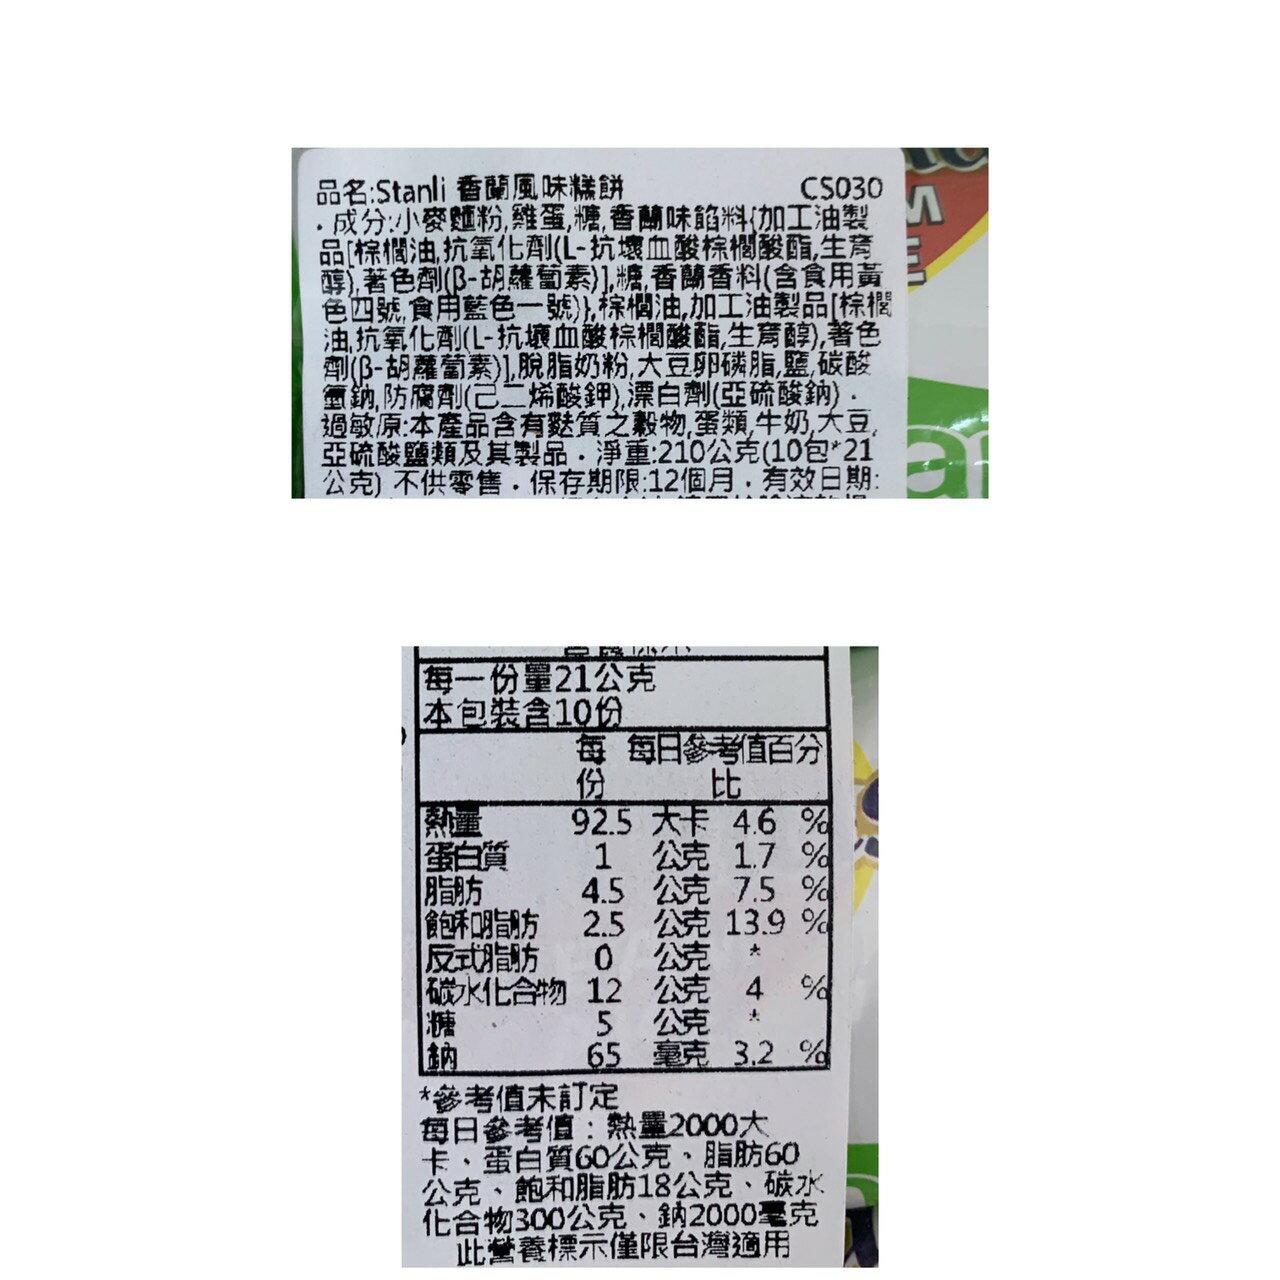 {泰菲印越} 印尼 stanli 香蘭蛋糕 padi mas cream cake pandan 10入